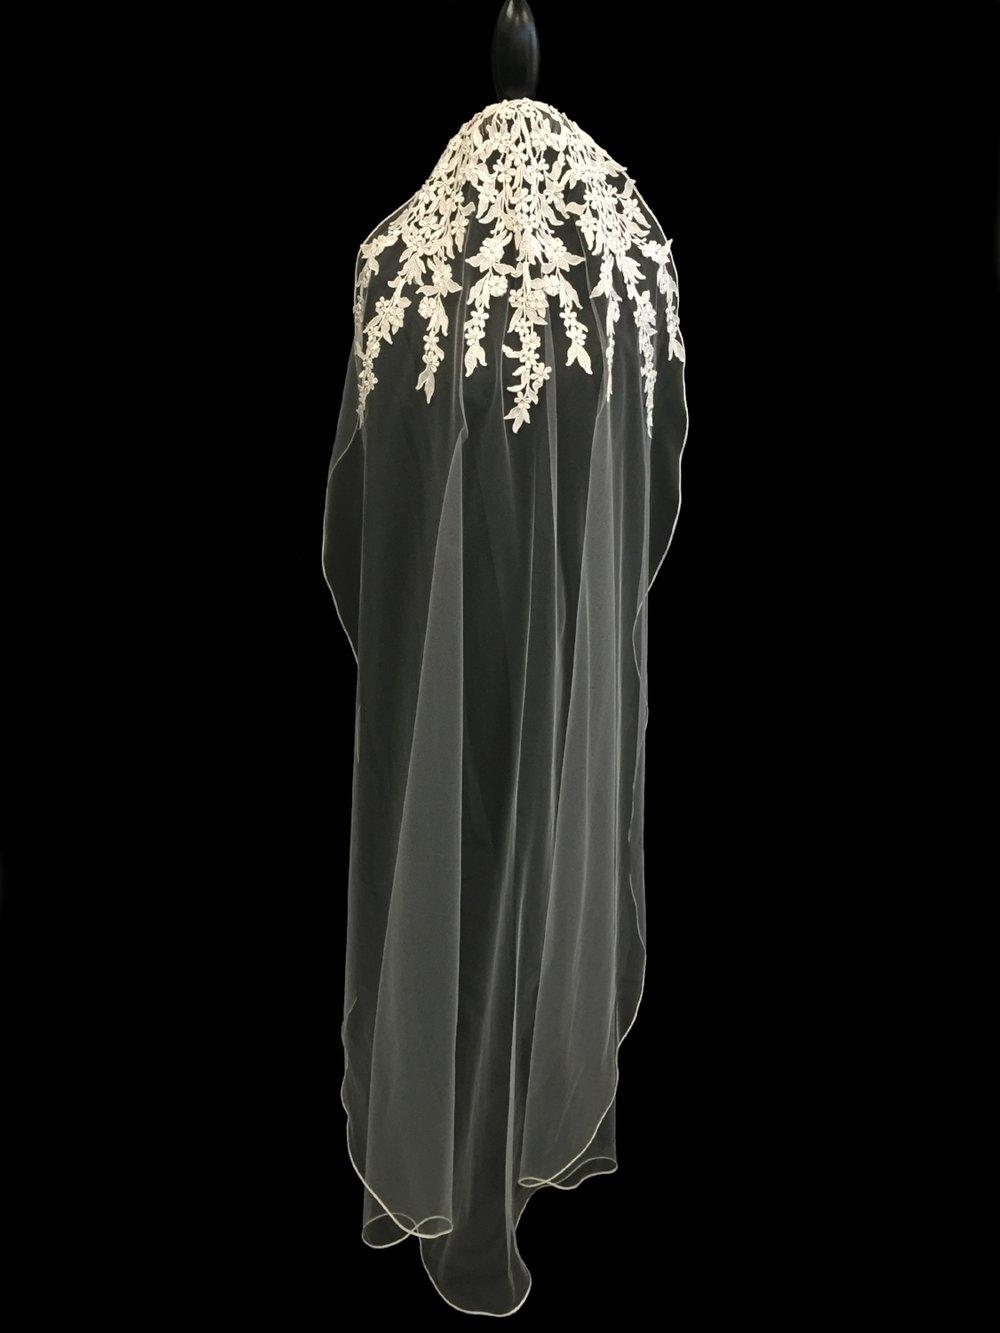 Style V5674-D _ 45x72 Oval Mantilla Guipure Lace Veil